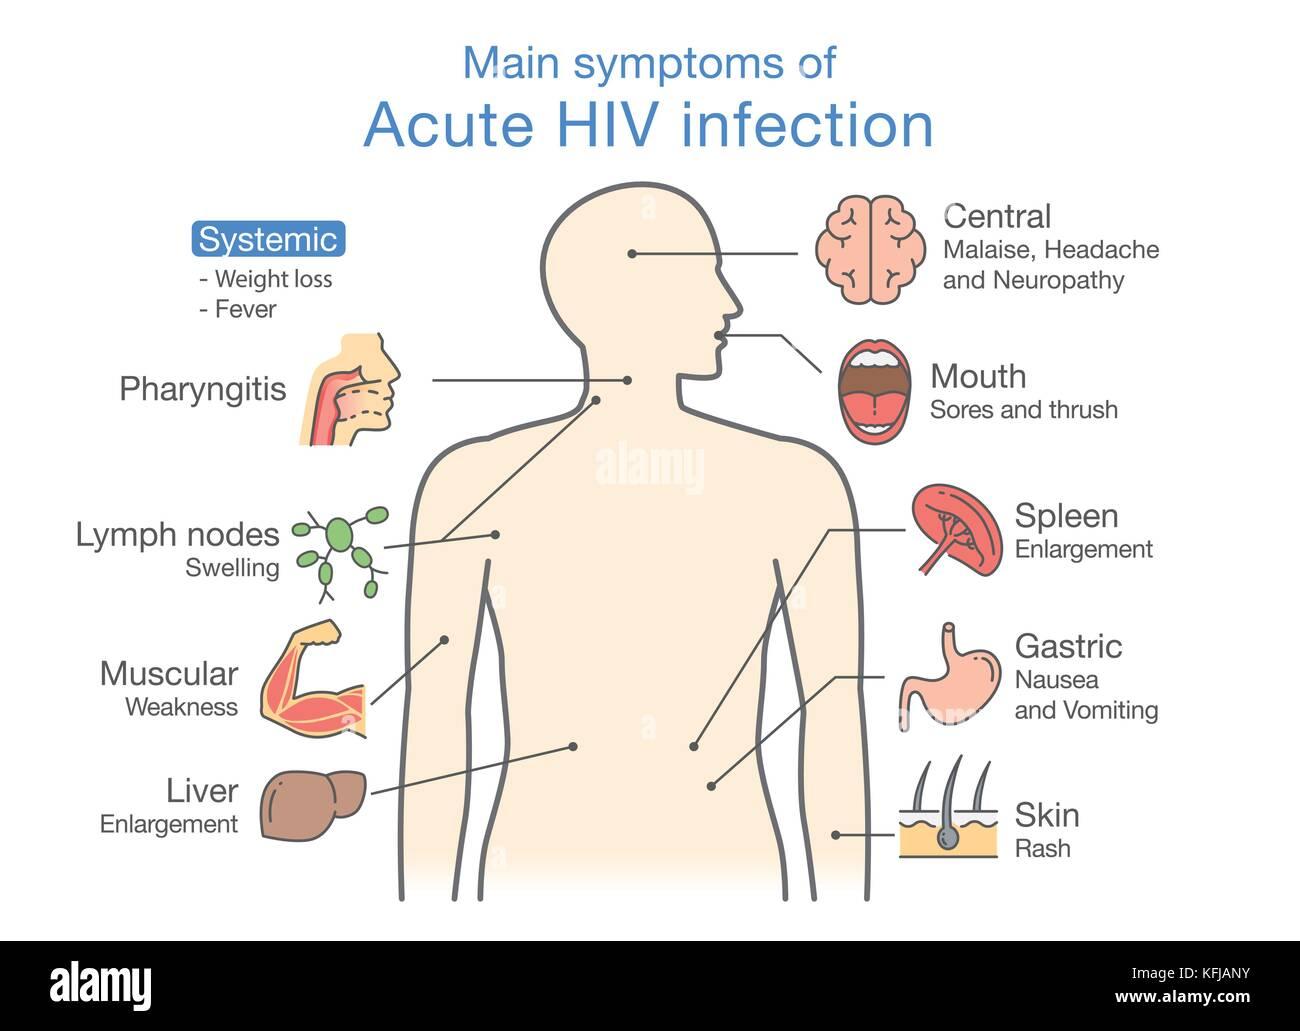 Main symptom of Acute HIV infection. - Stock Image